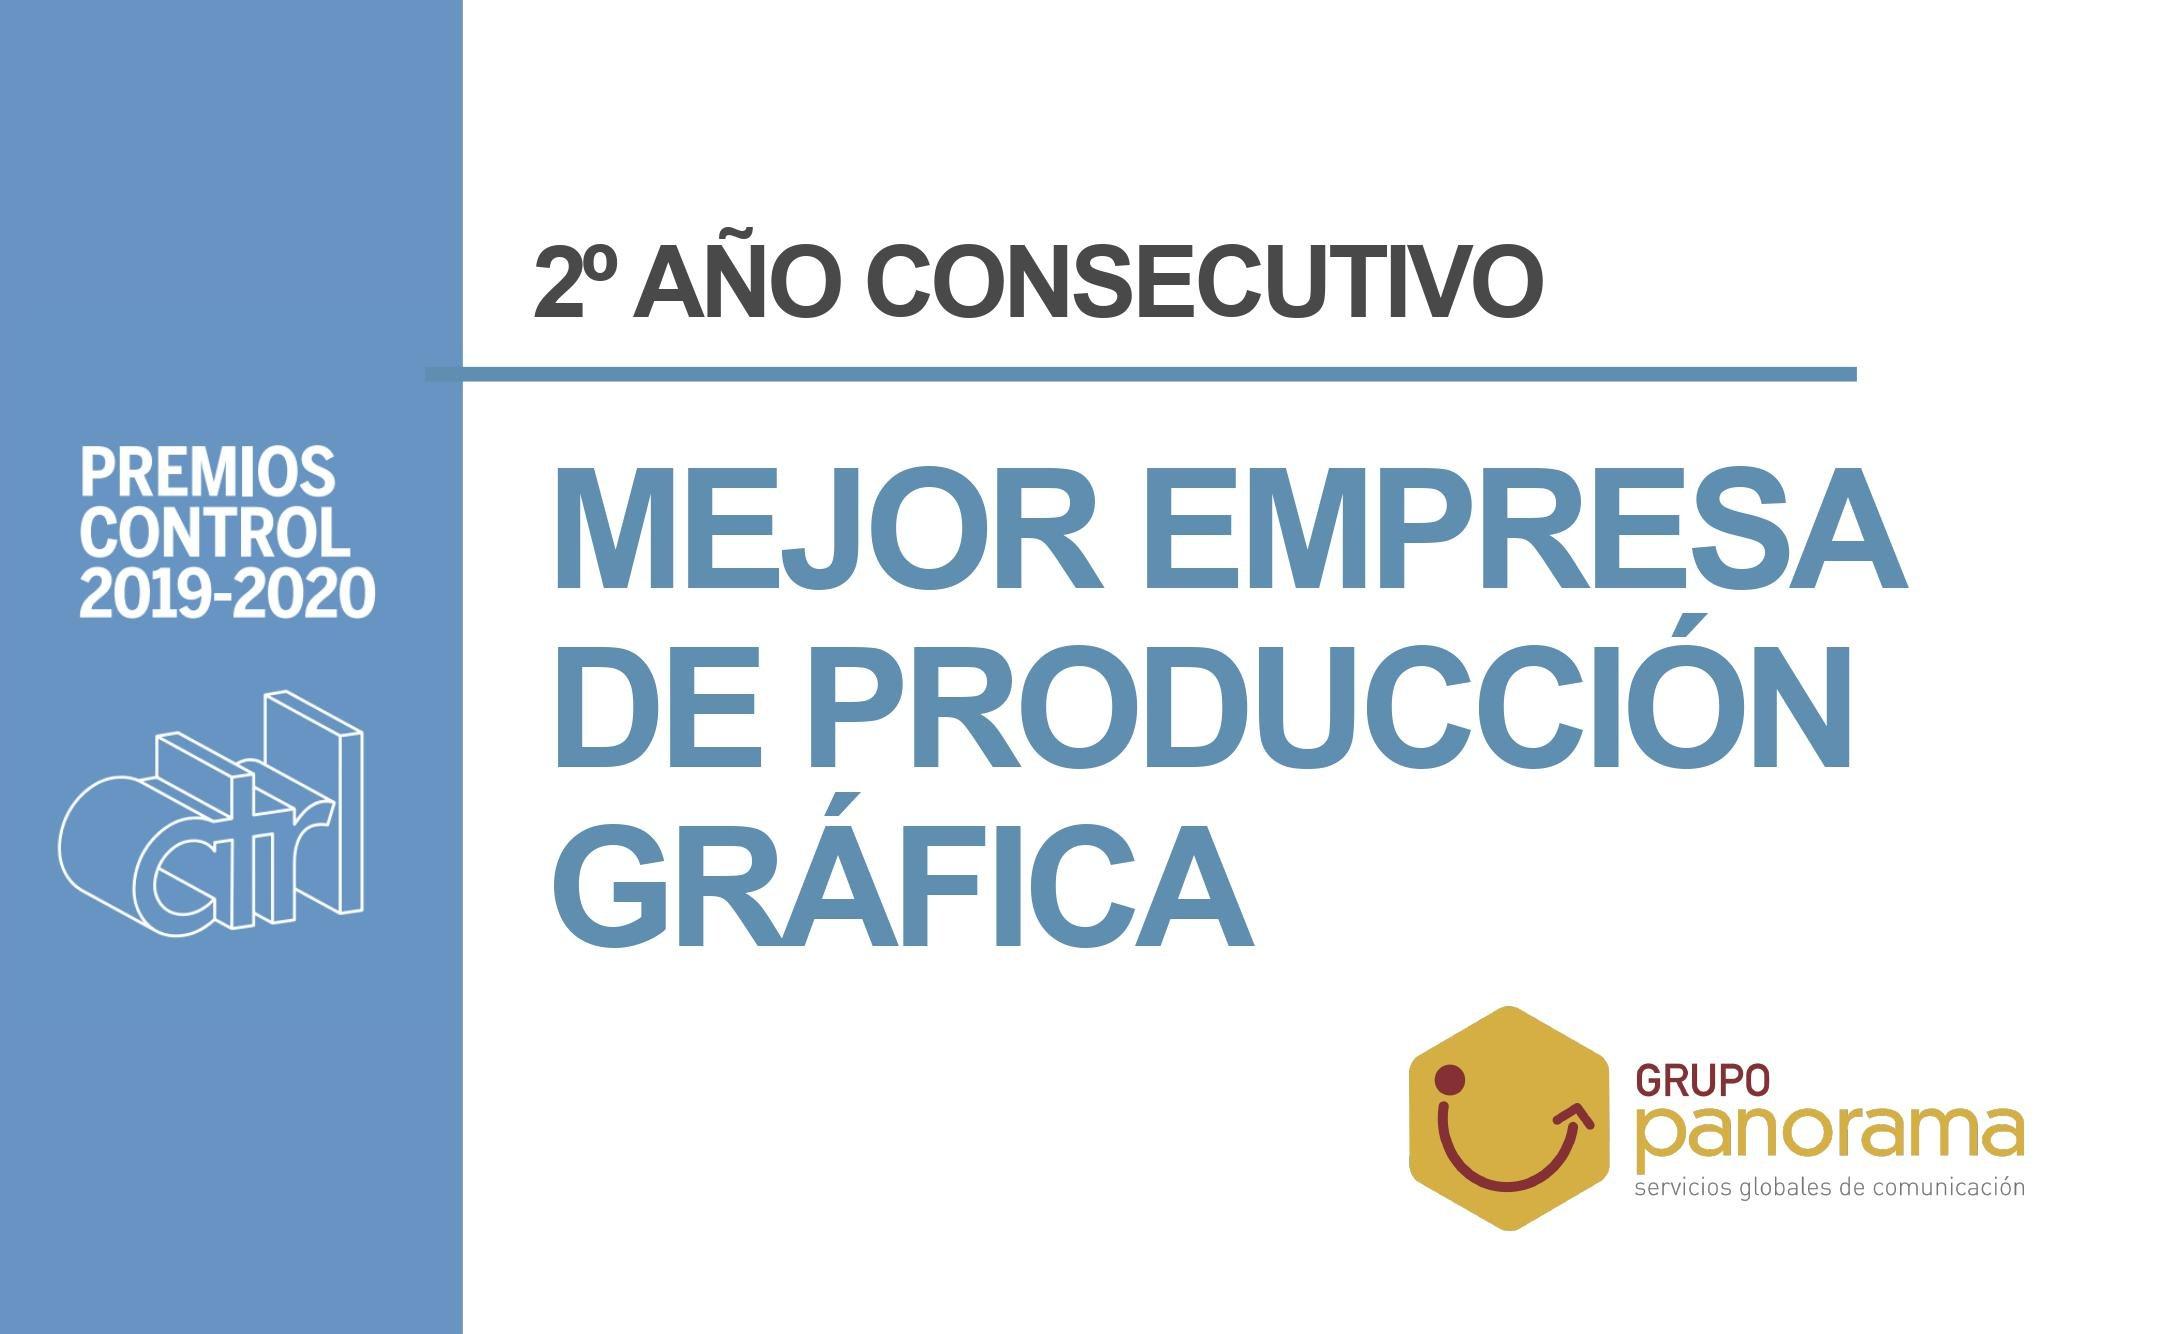 Premio Ctrl 2020 a Mejor Empresa de Producción Gráfica